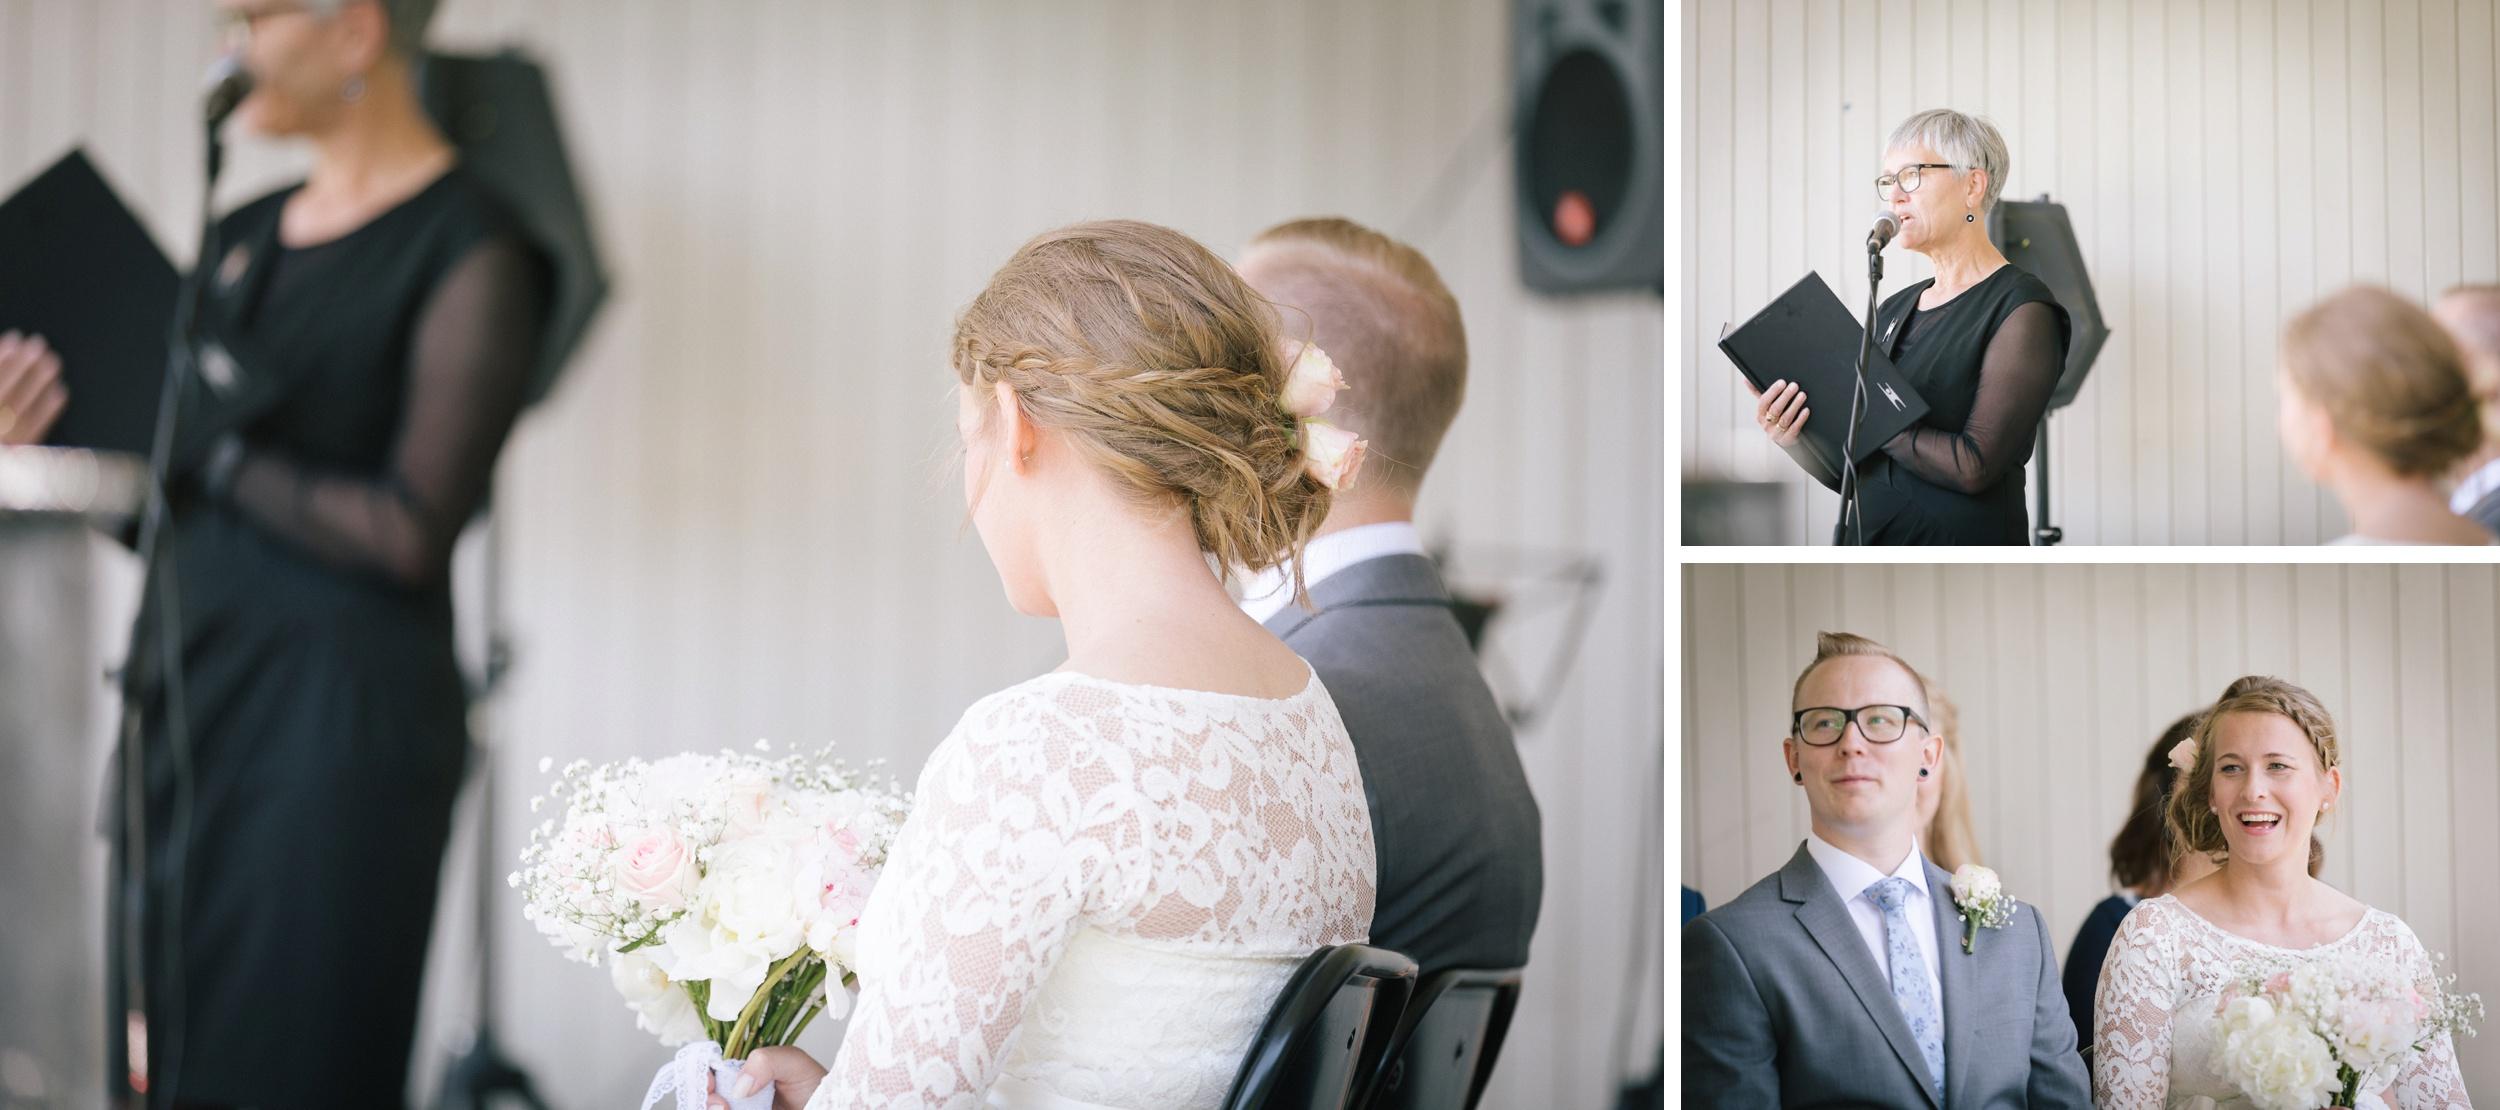 bryllup-bryllupsfotografering-bryllupsfotograf-sarpsborg-20170617-_H2A1988anneli_phillip_WEB.jpg